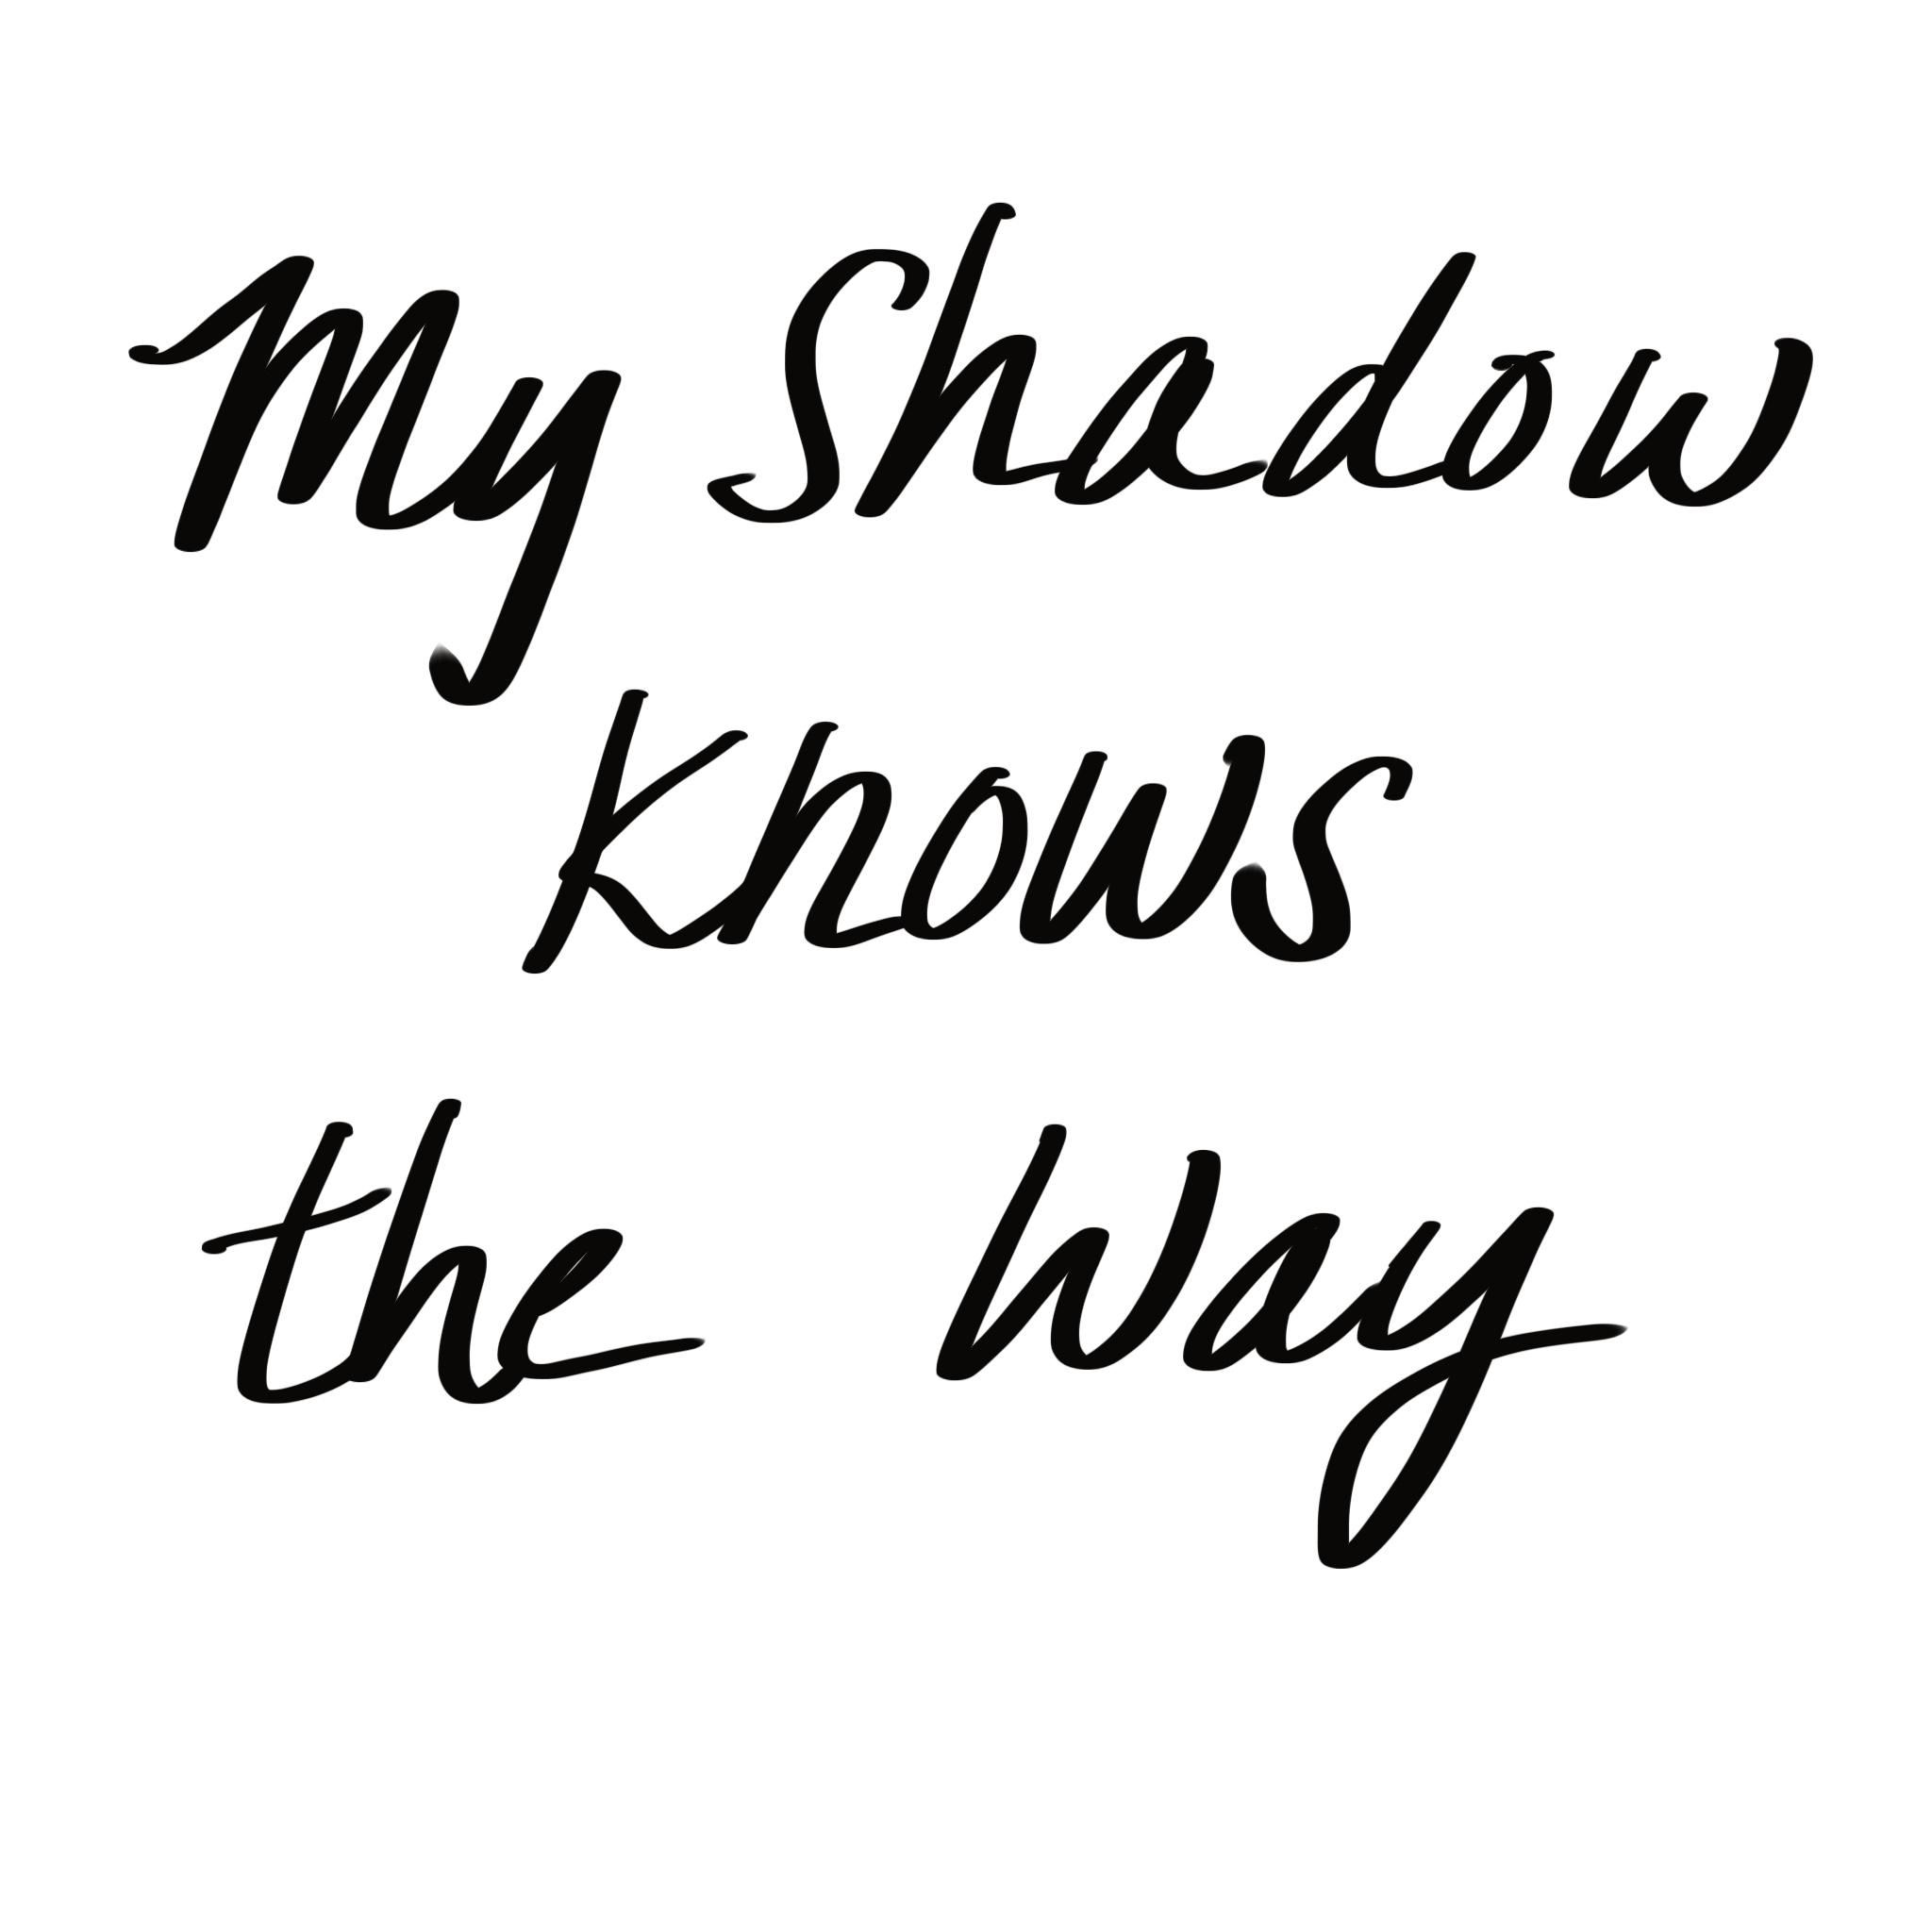 JenBaxterShadow.JPG